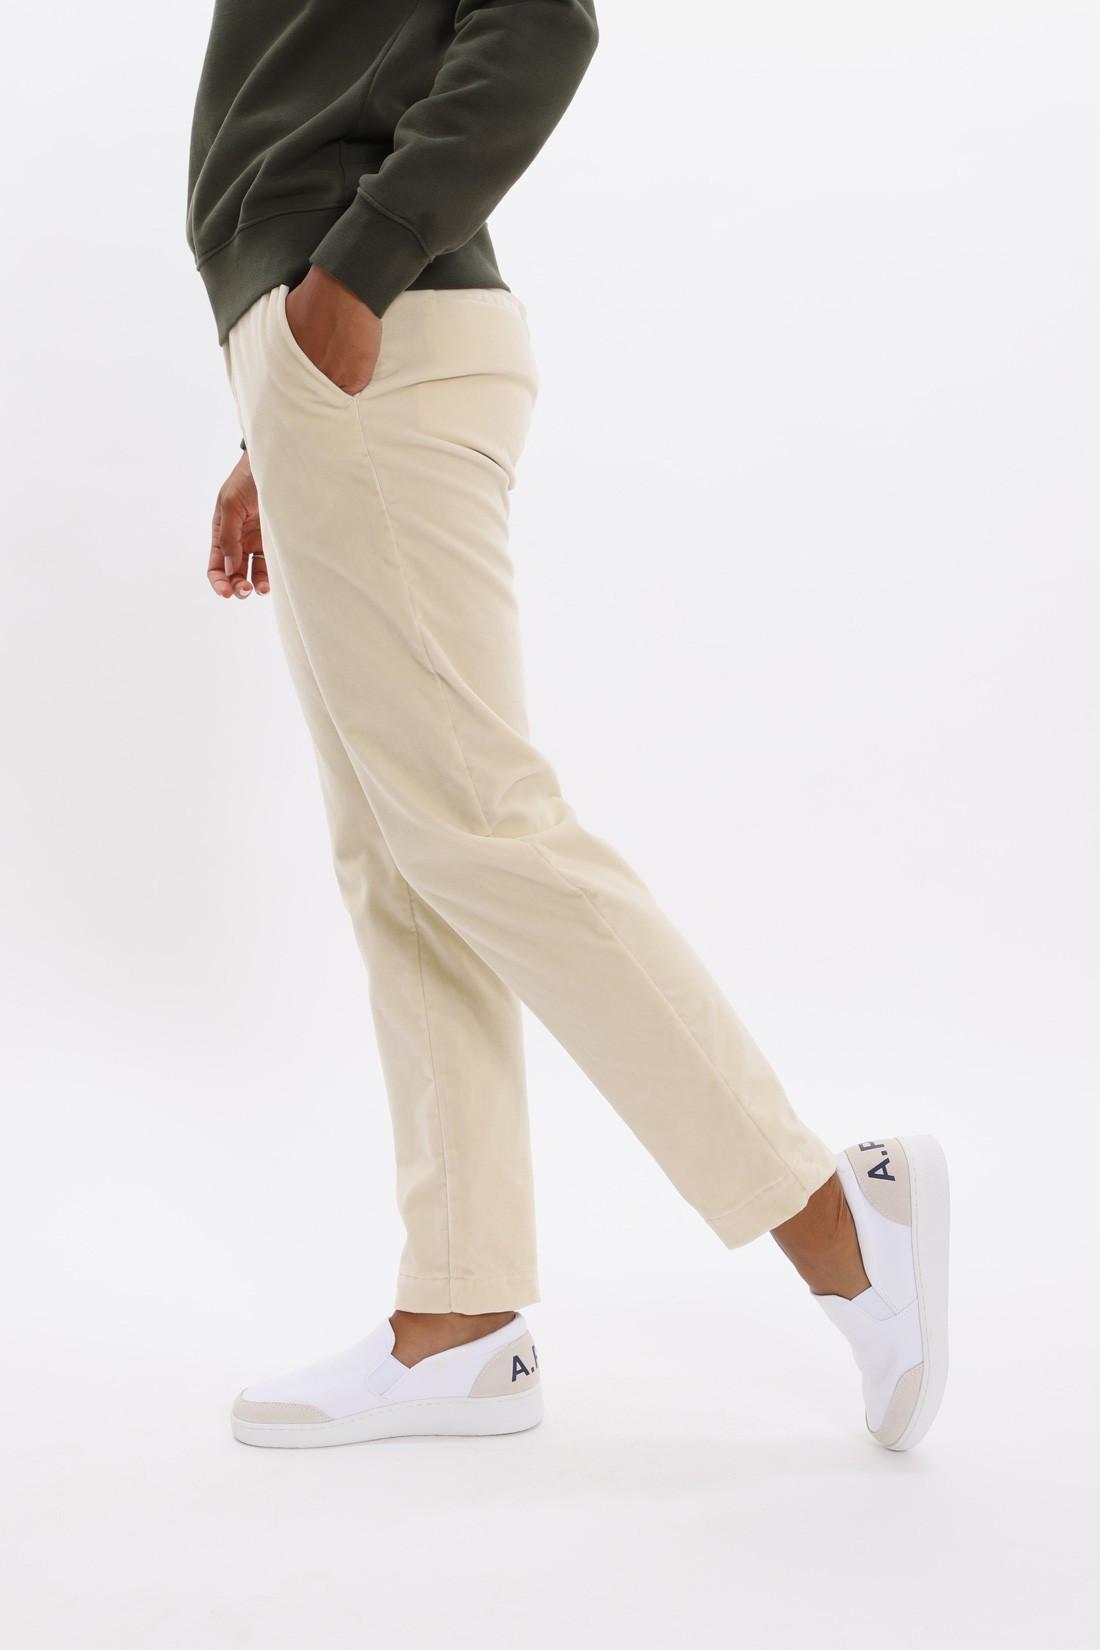 BARENA FOR WOMAN / Pantalone ersilia loredan Avorio